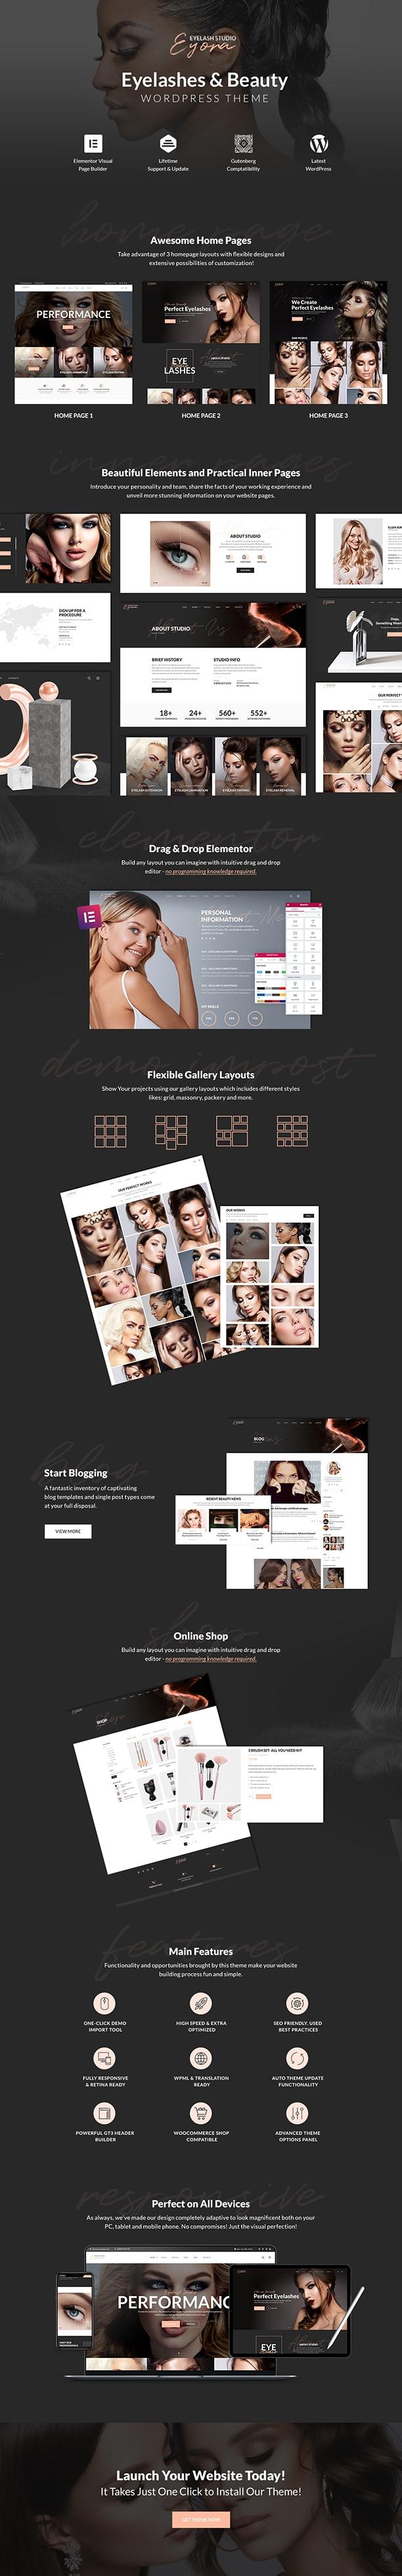 Eyora – Eyelash Extension WordPress Theme - 2